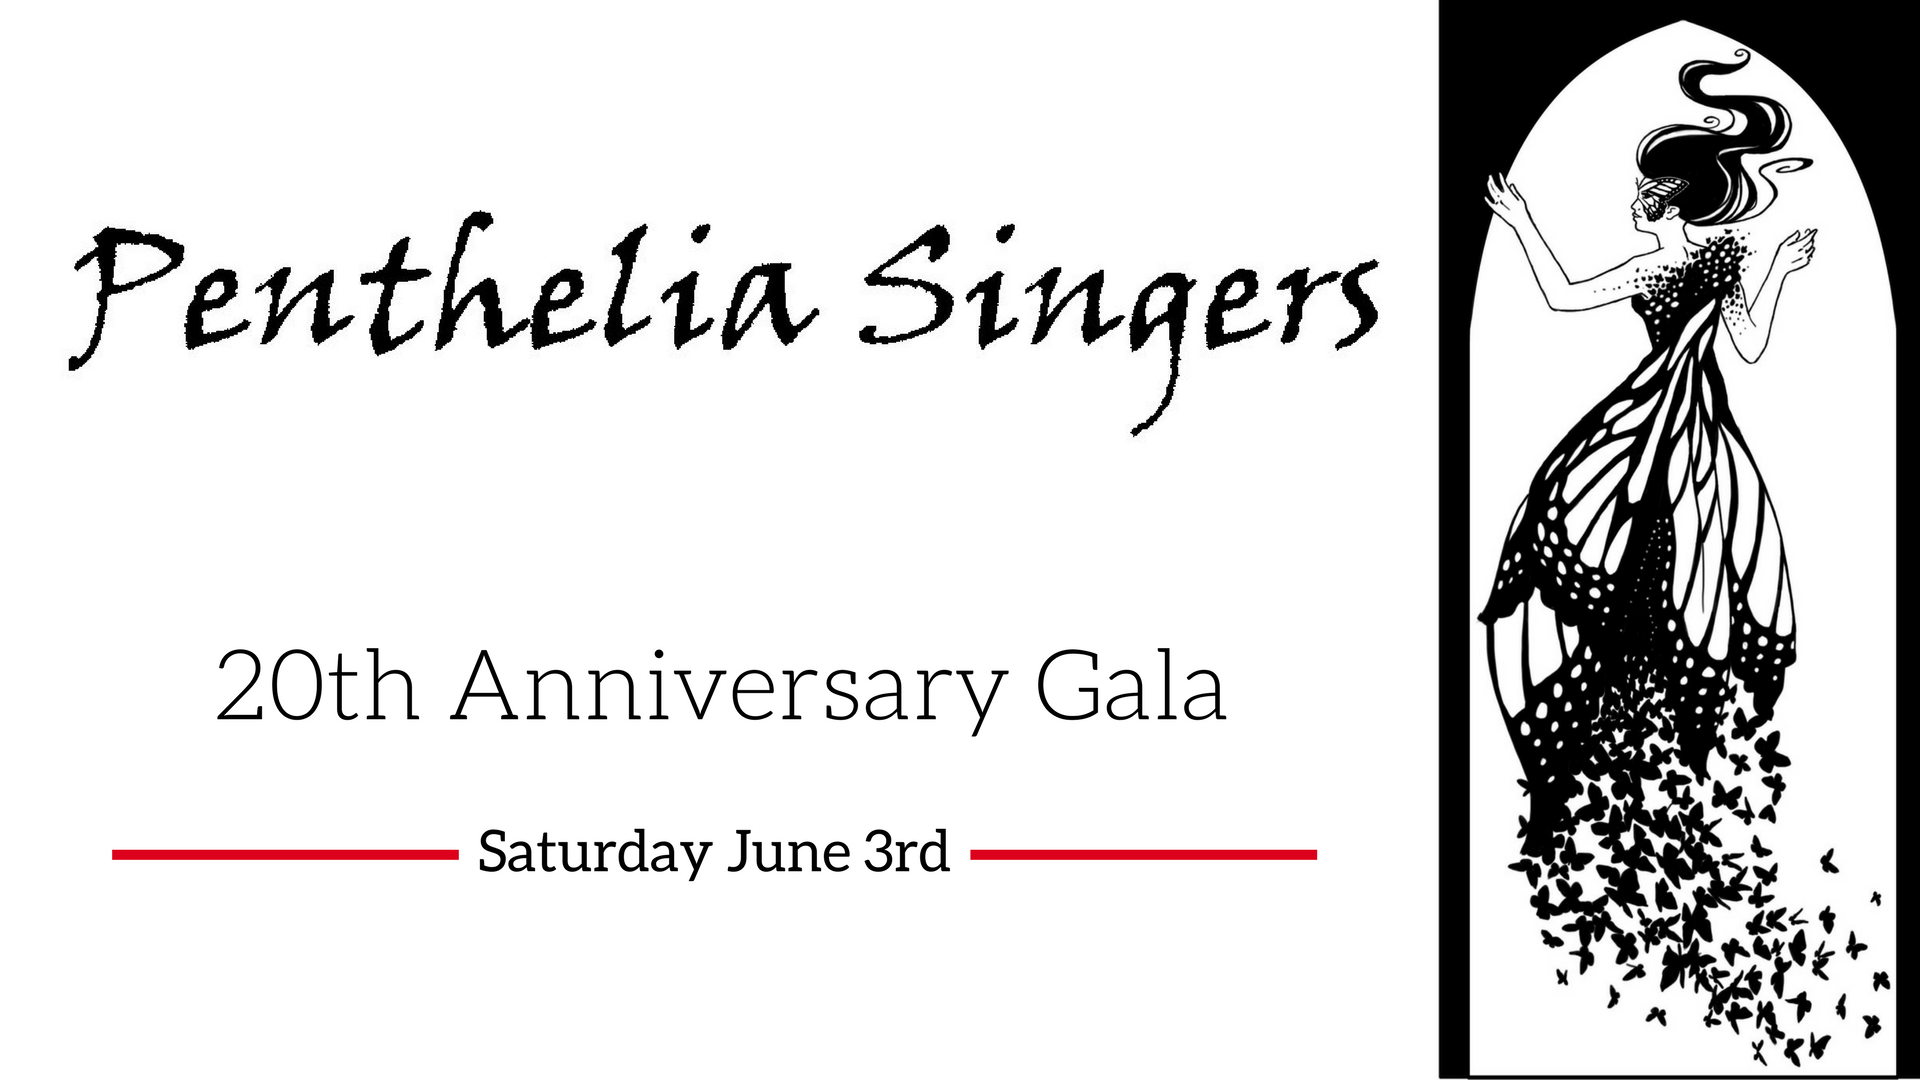 Penthelia Singers 20th Anniversary Gala